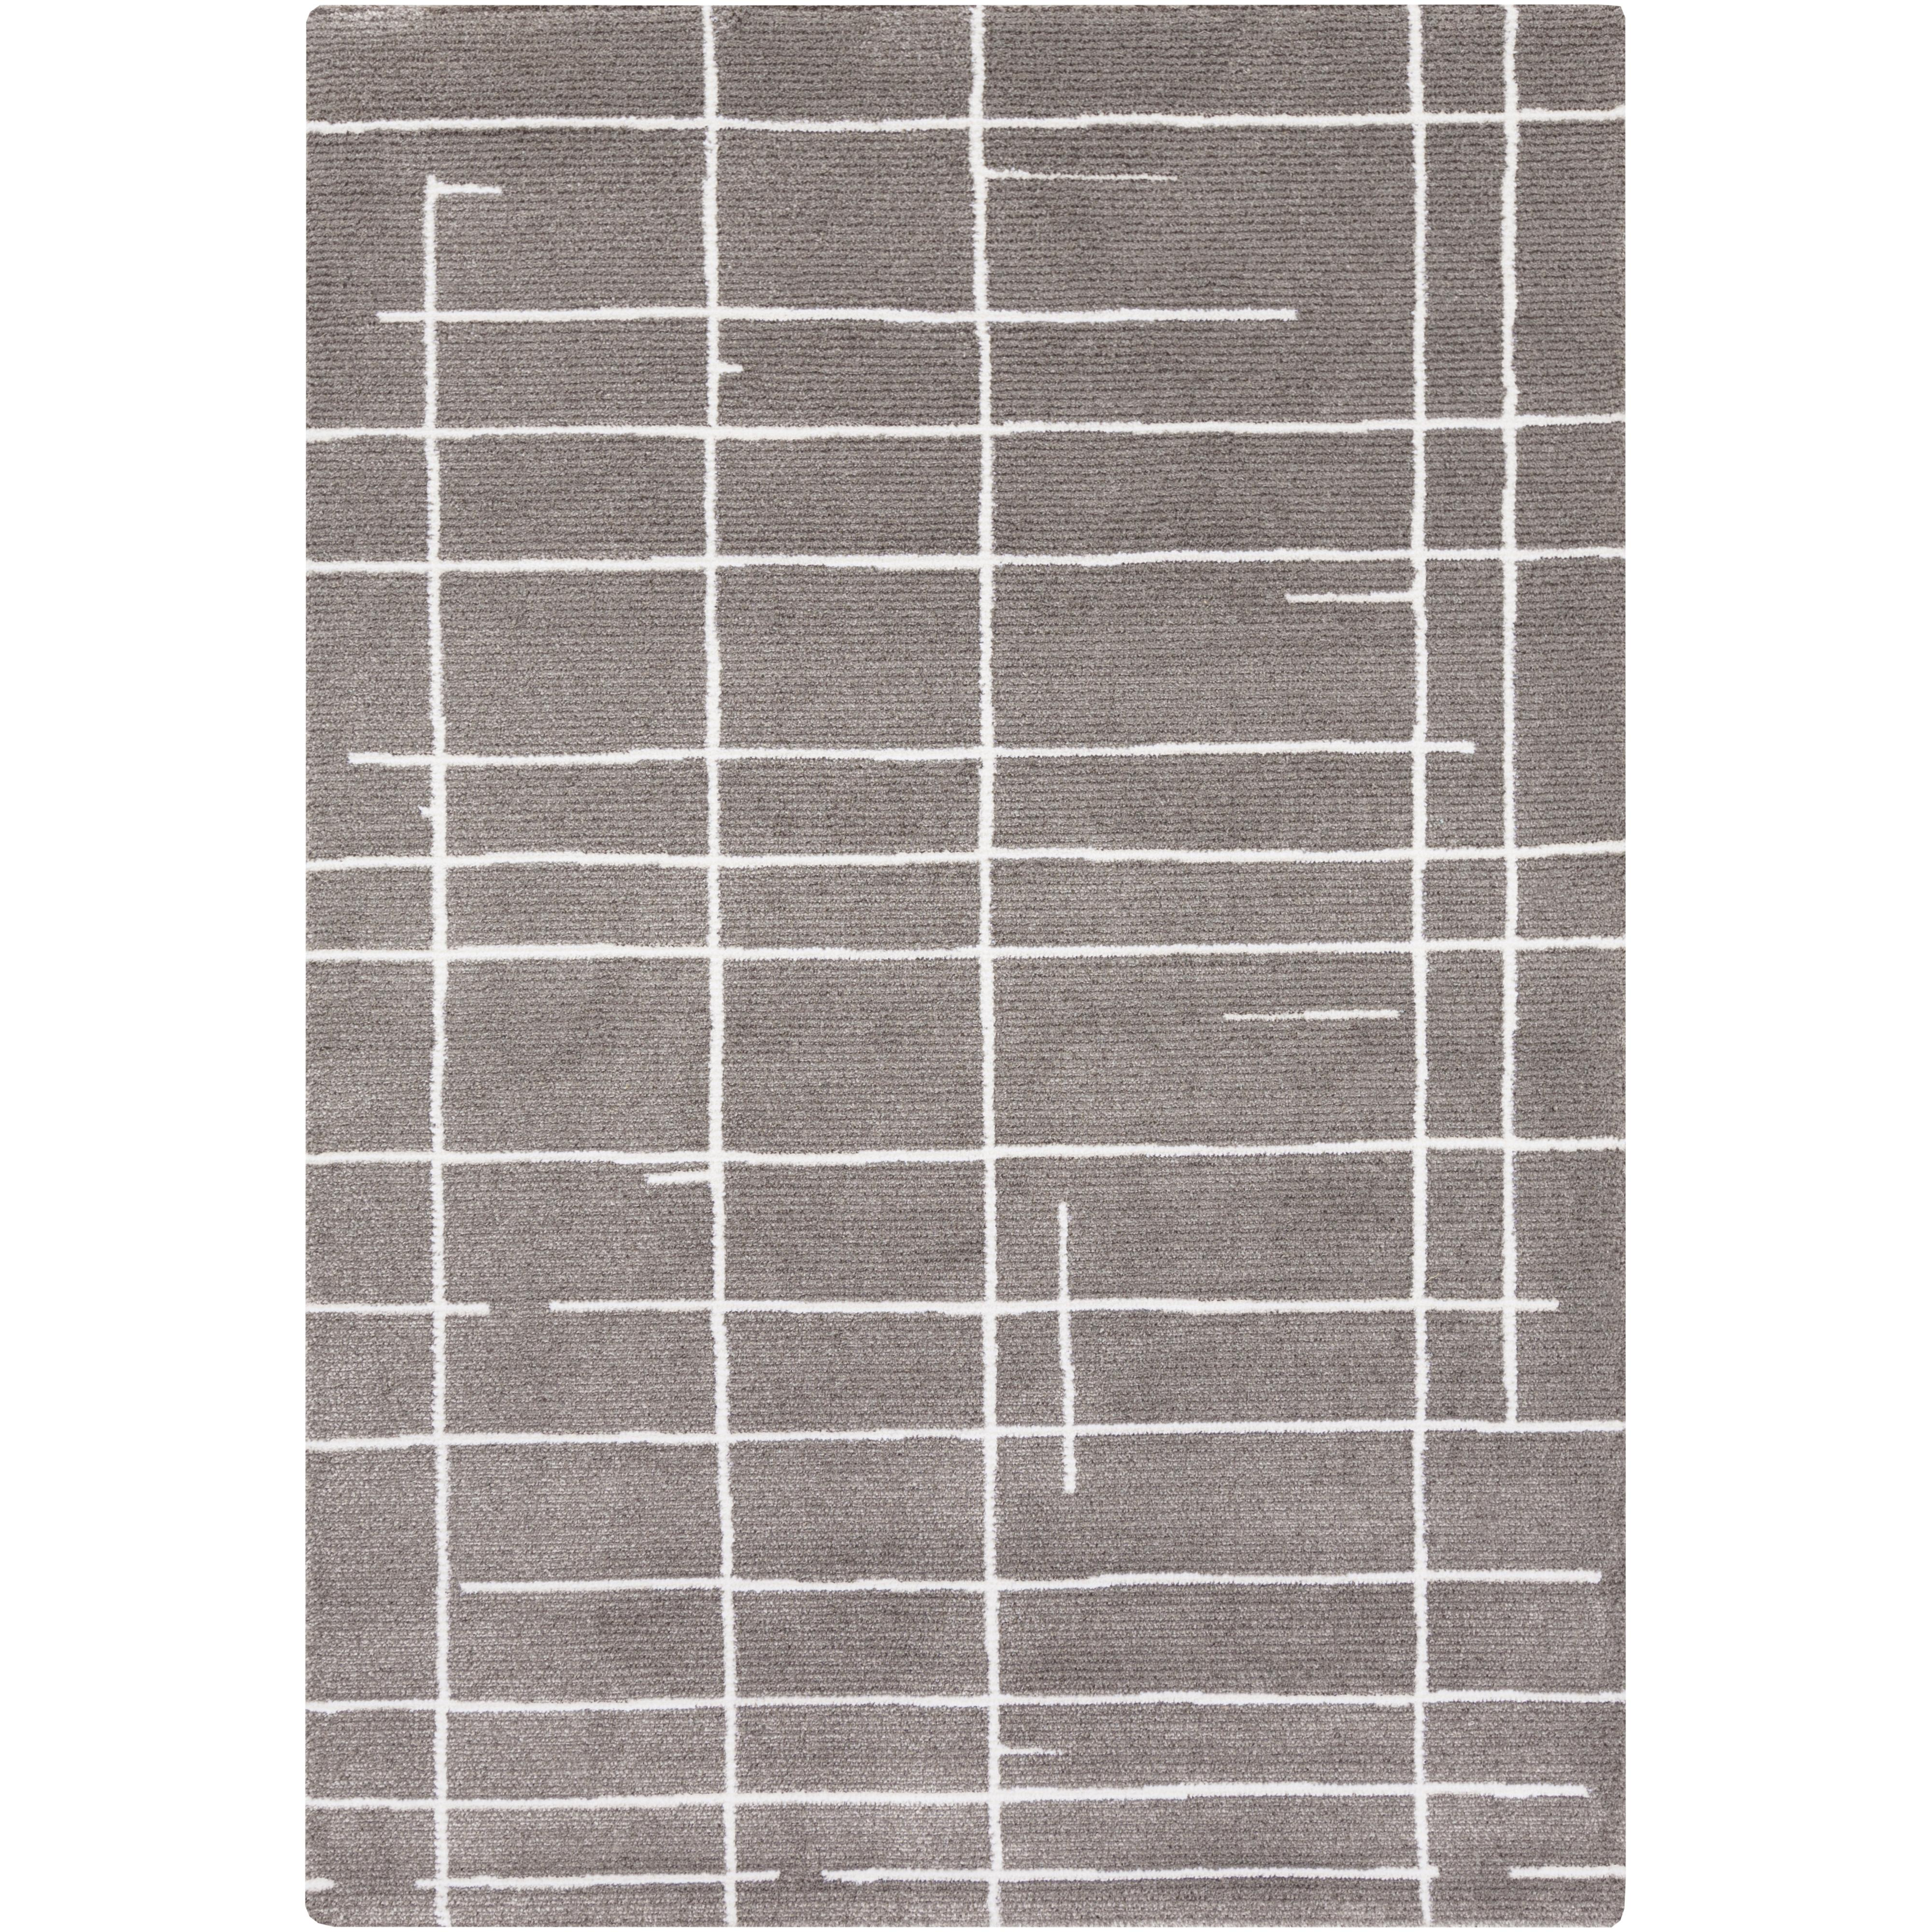 Surya Rugs Perla 2' x 3' - Item Number: PRA6006-23